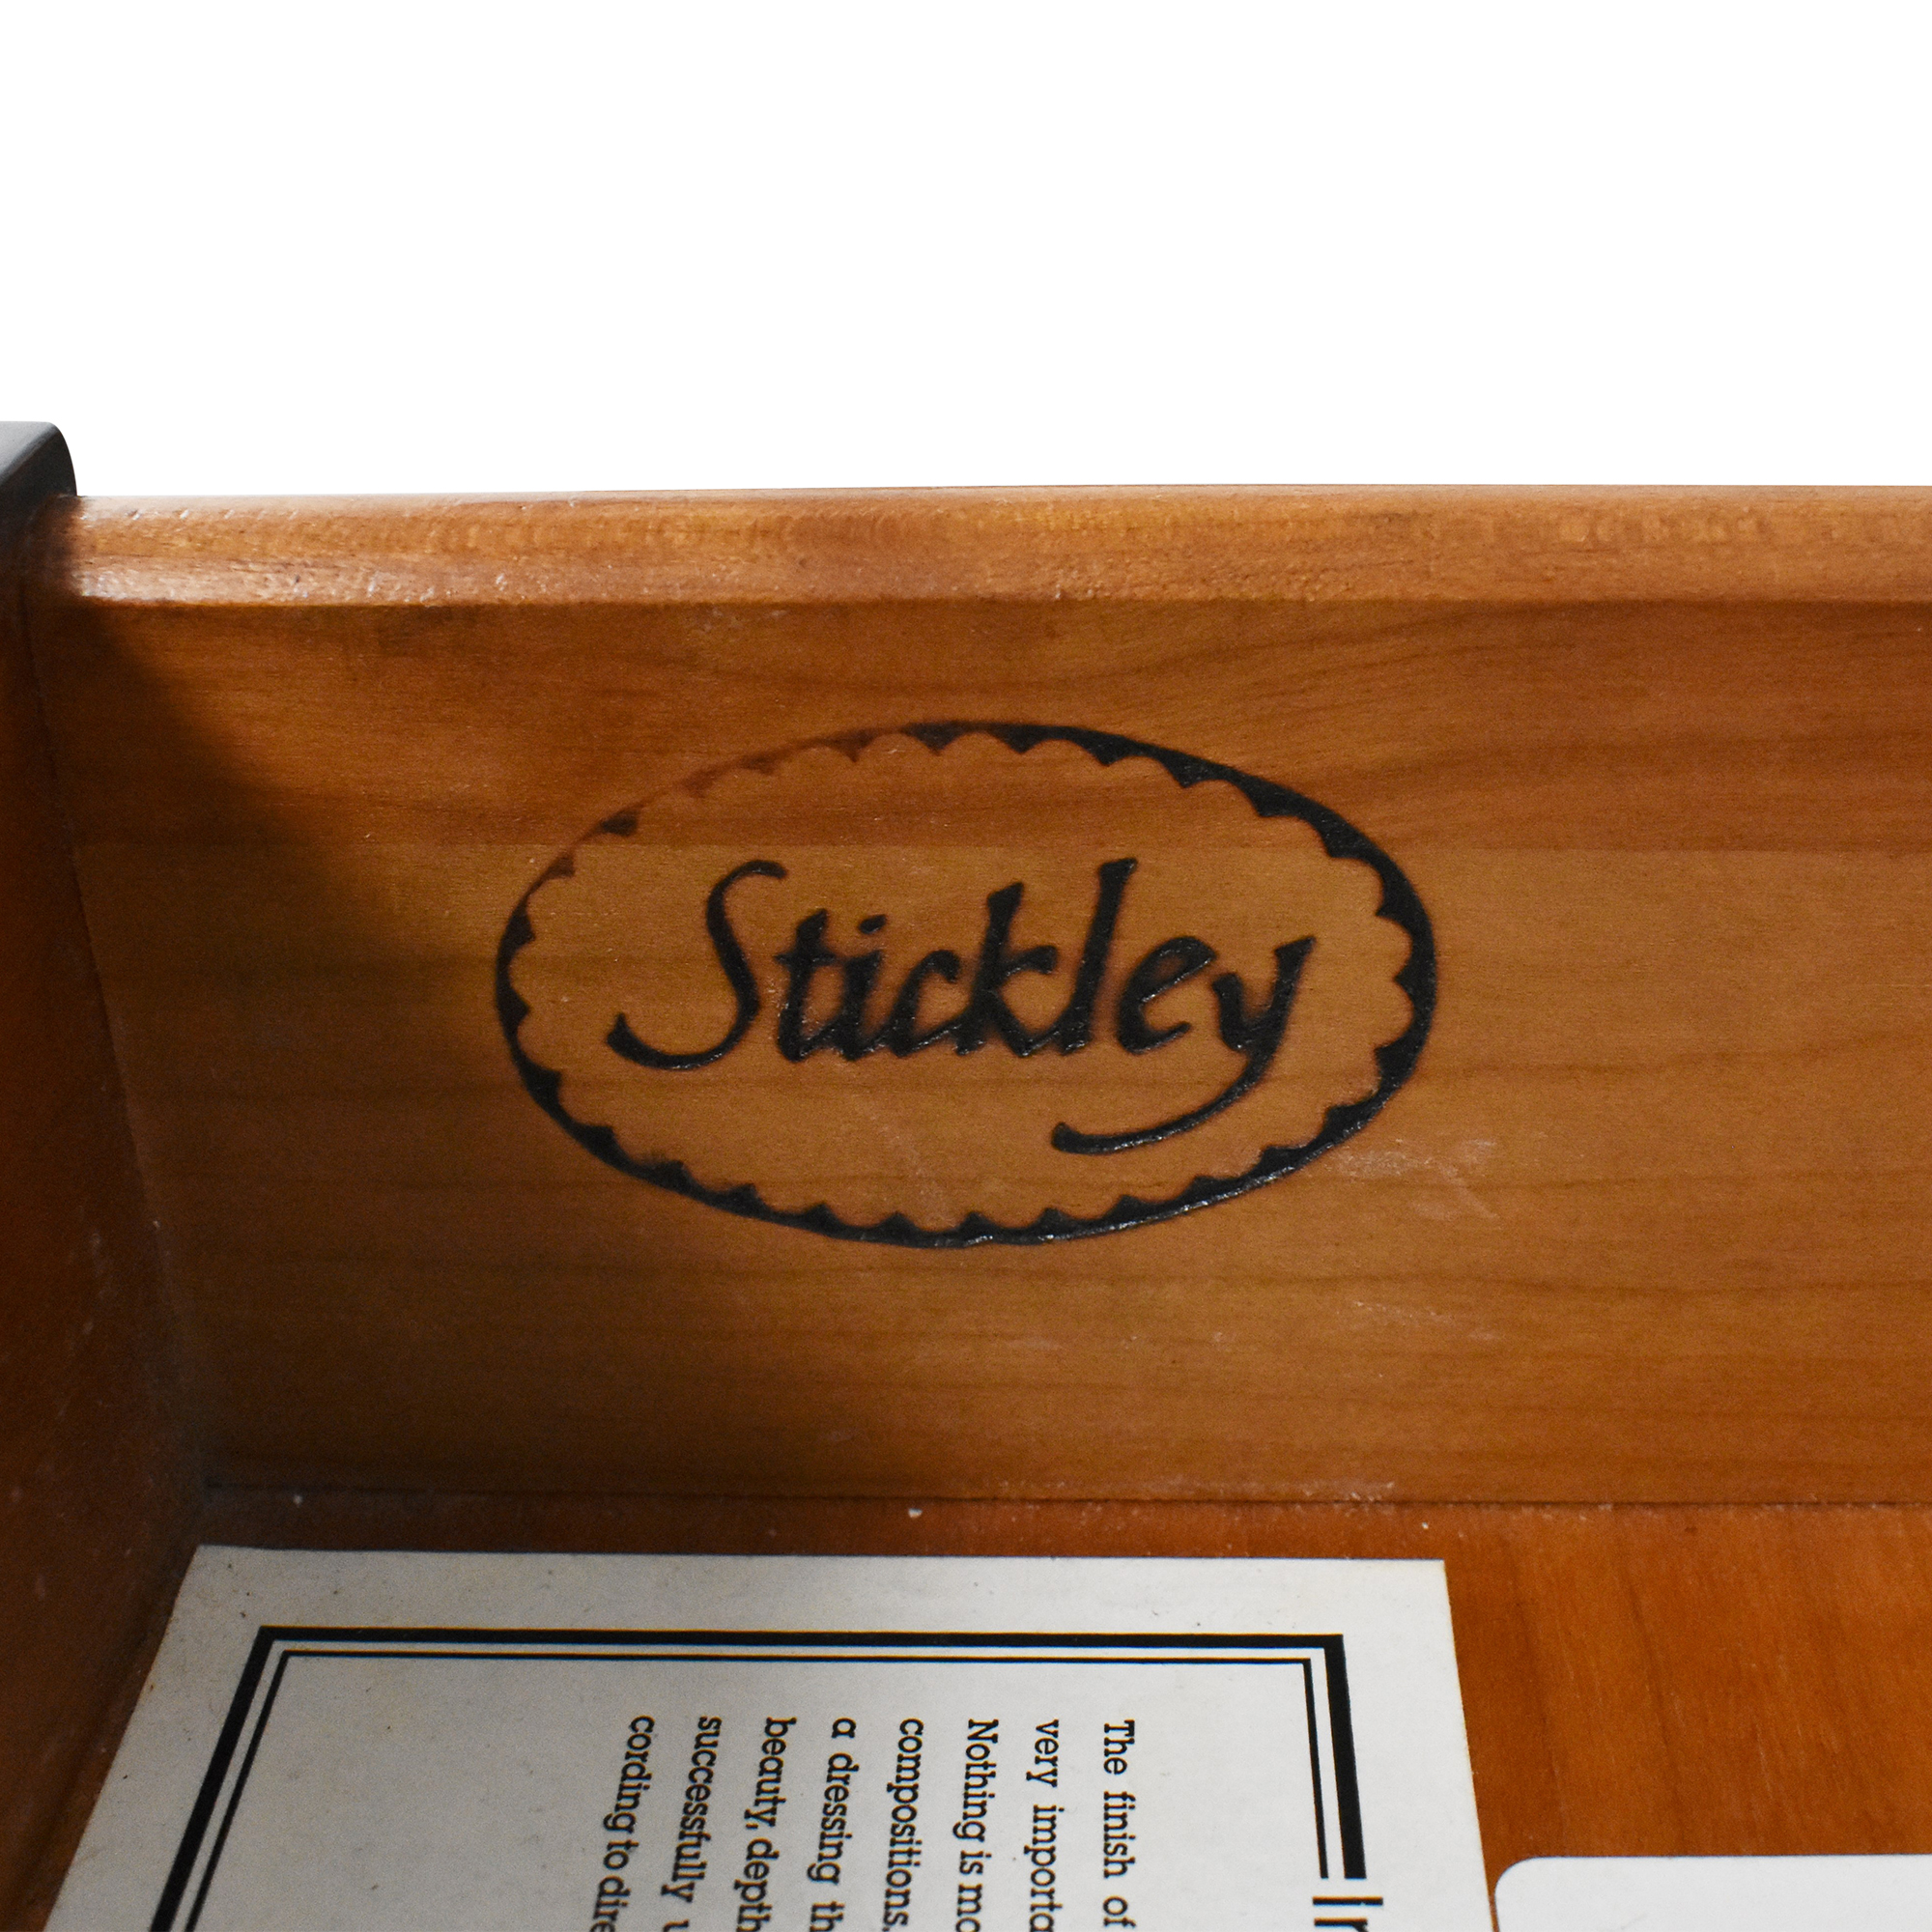 Stickley Furniture Stickley Furniture Nightstands discount